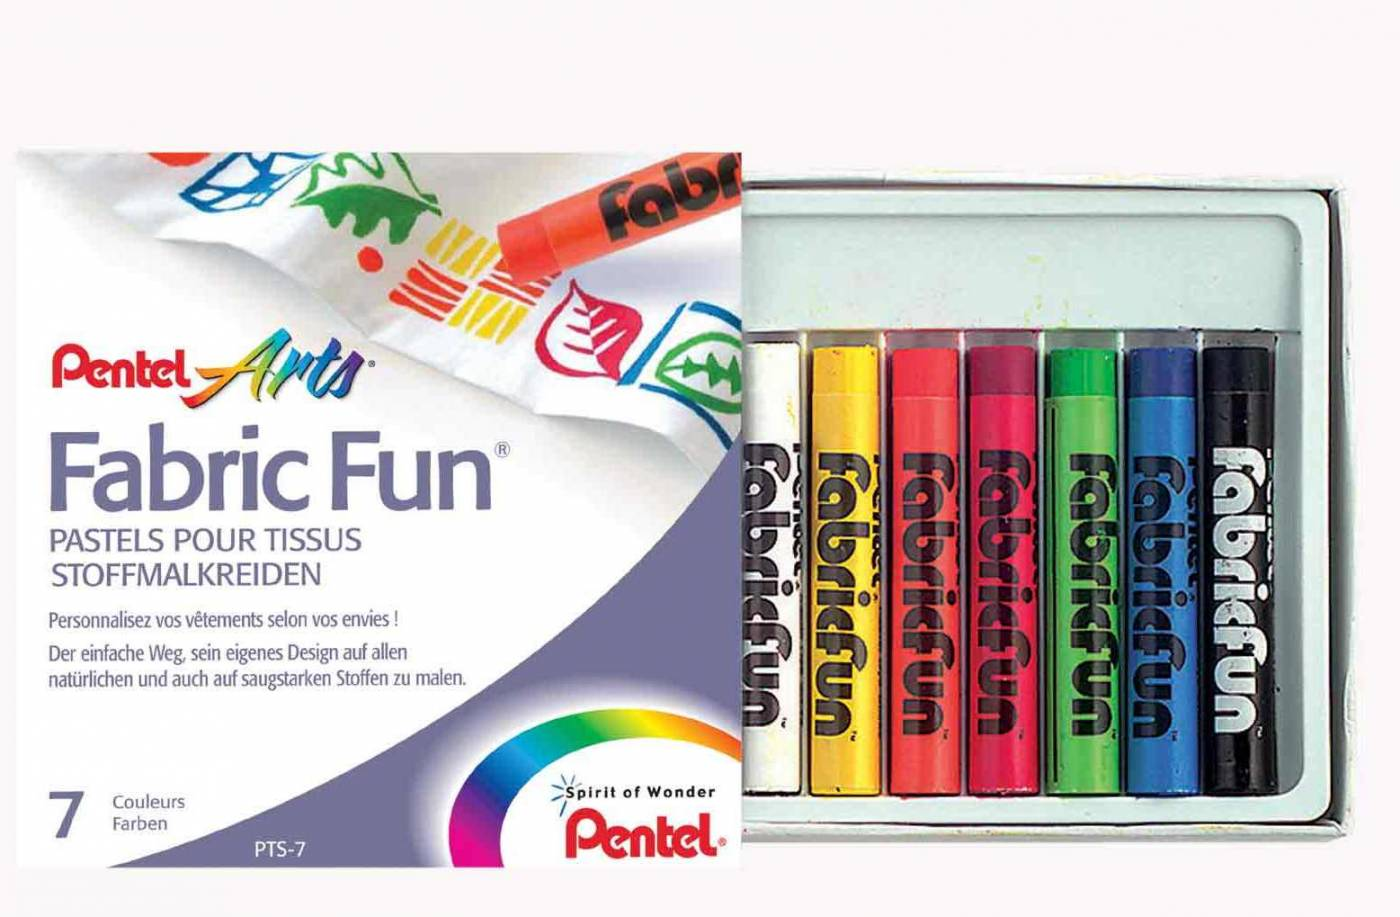 Giz Pastel Seco Pentel Fabric Fun 7 Cores PTS-7